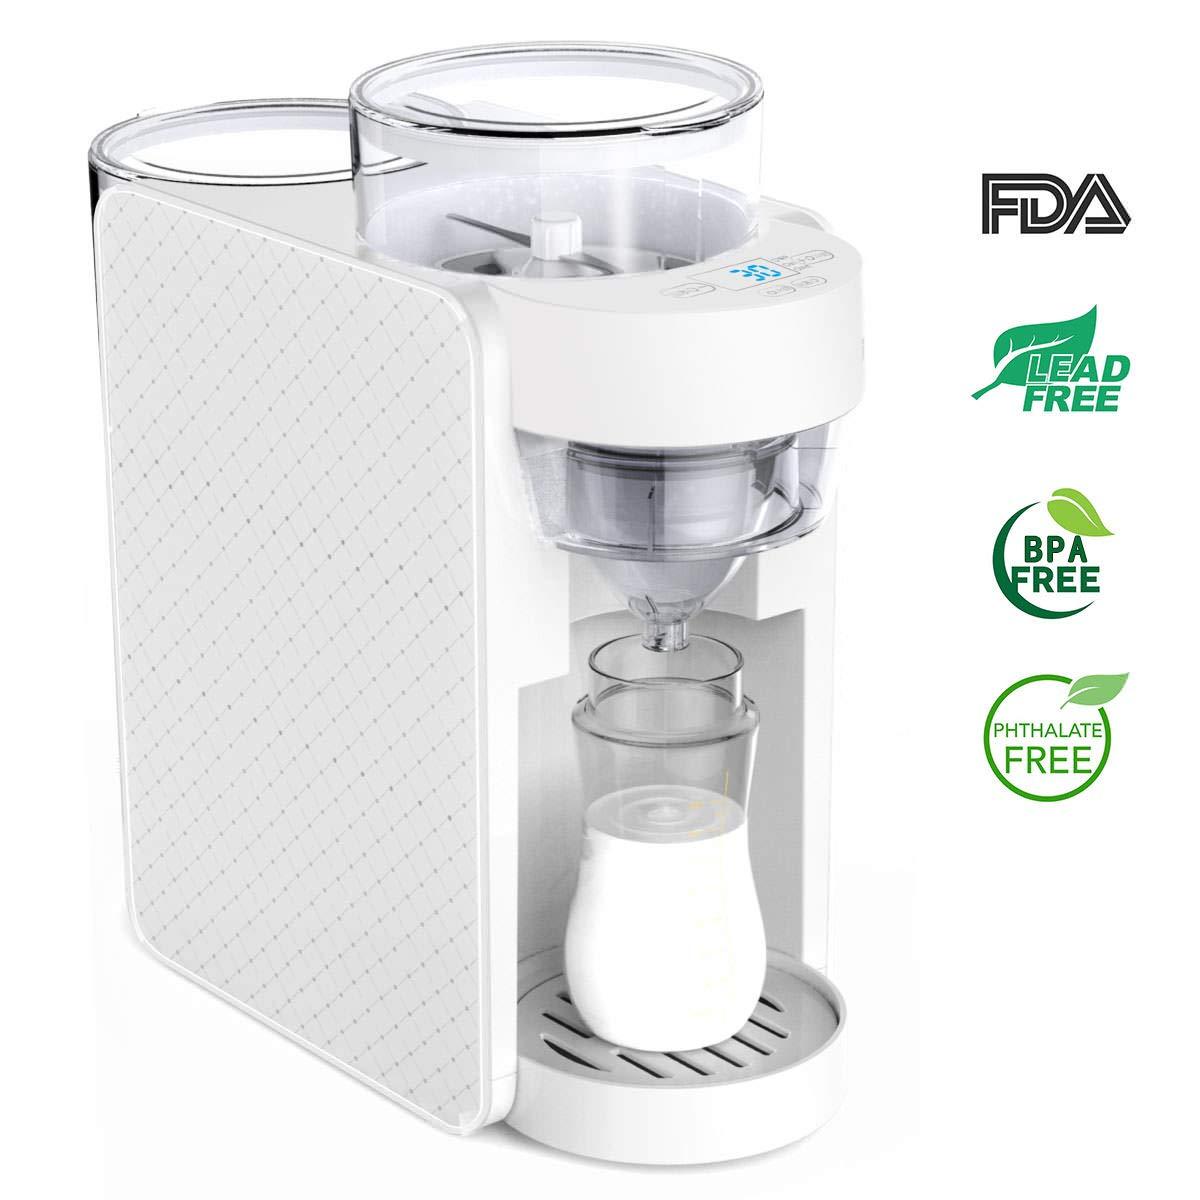 Fy-Light Smart Formula Maker Instant Baby Milk Powder Brewing Machine Automatic Milk Dispenser Intelligent Milking Mixer by Fy-Light